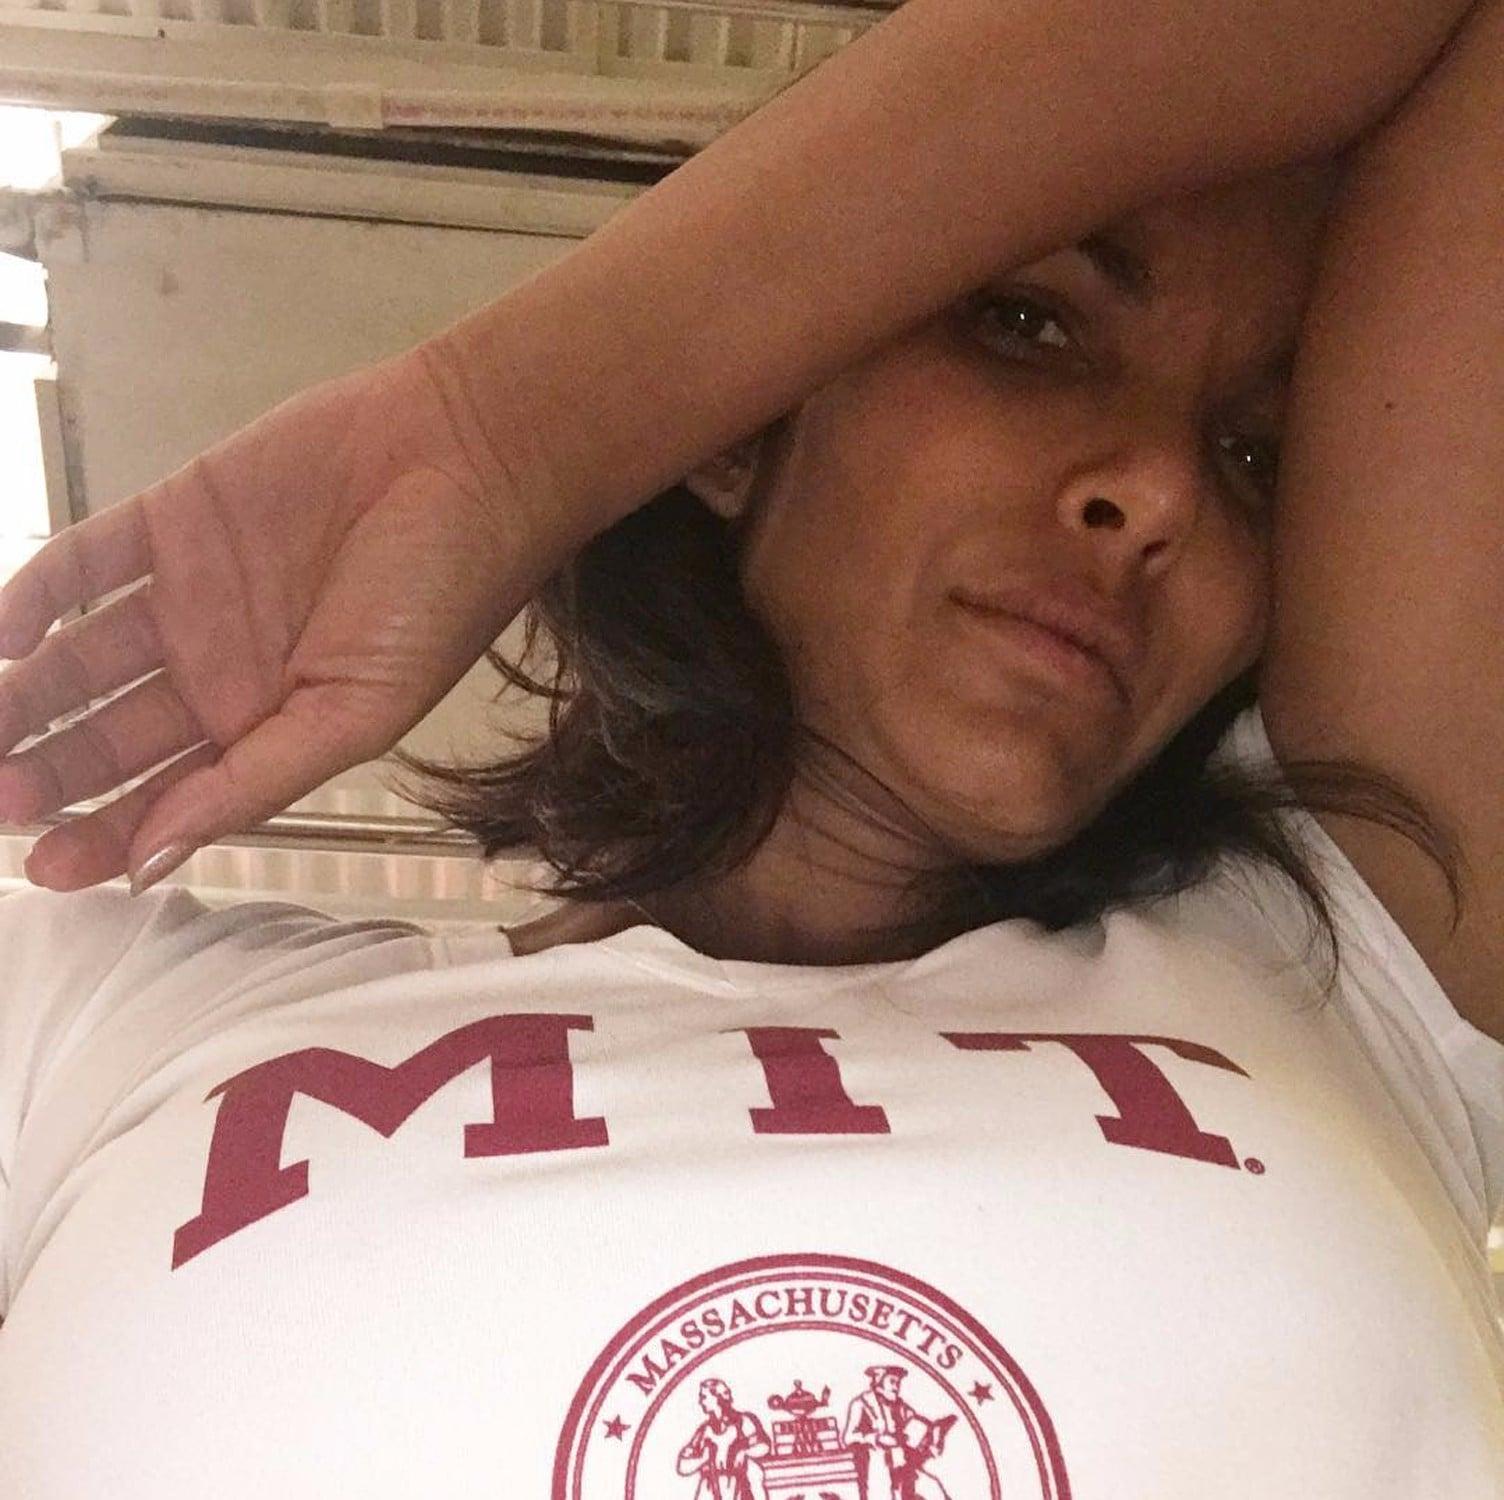 Sexy webcam video